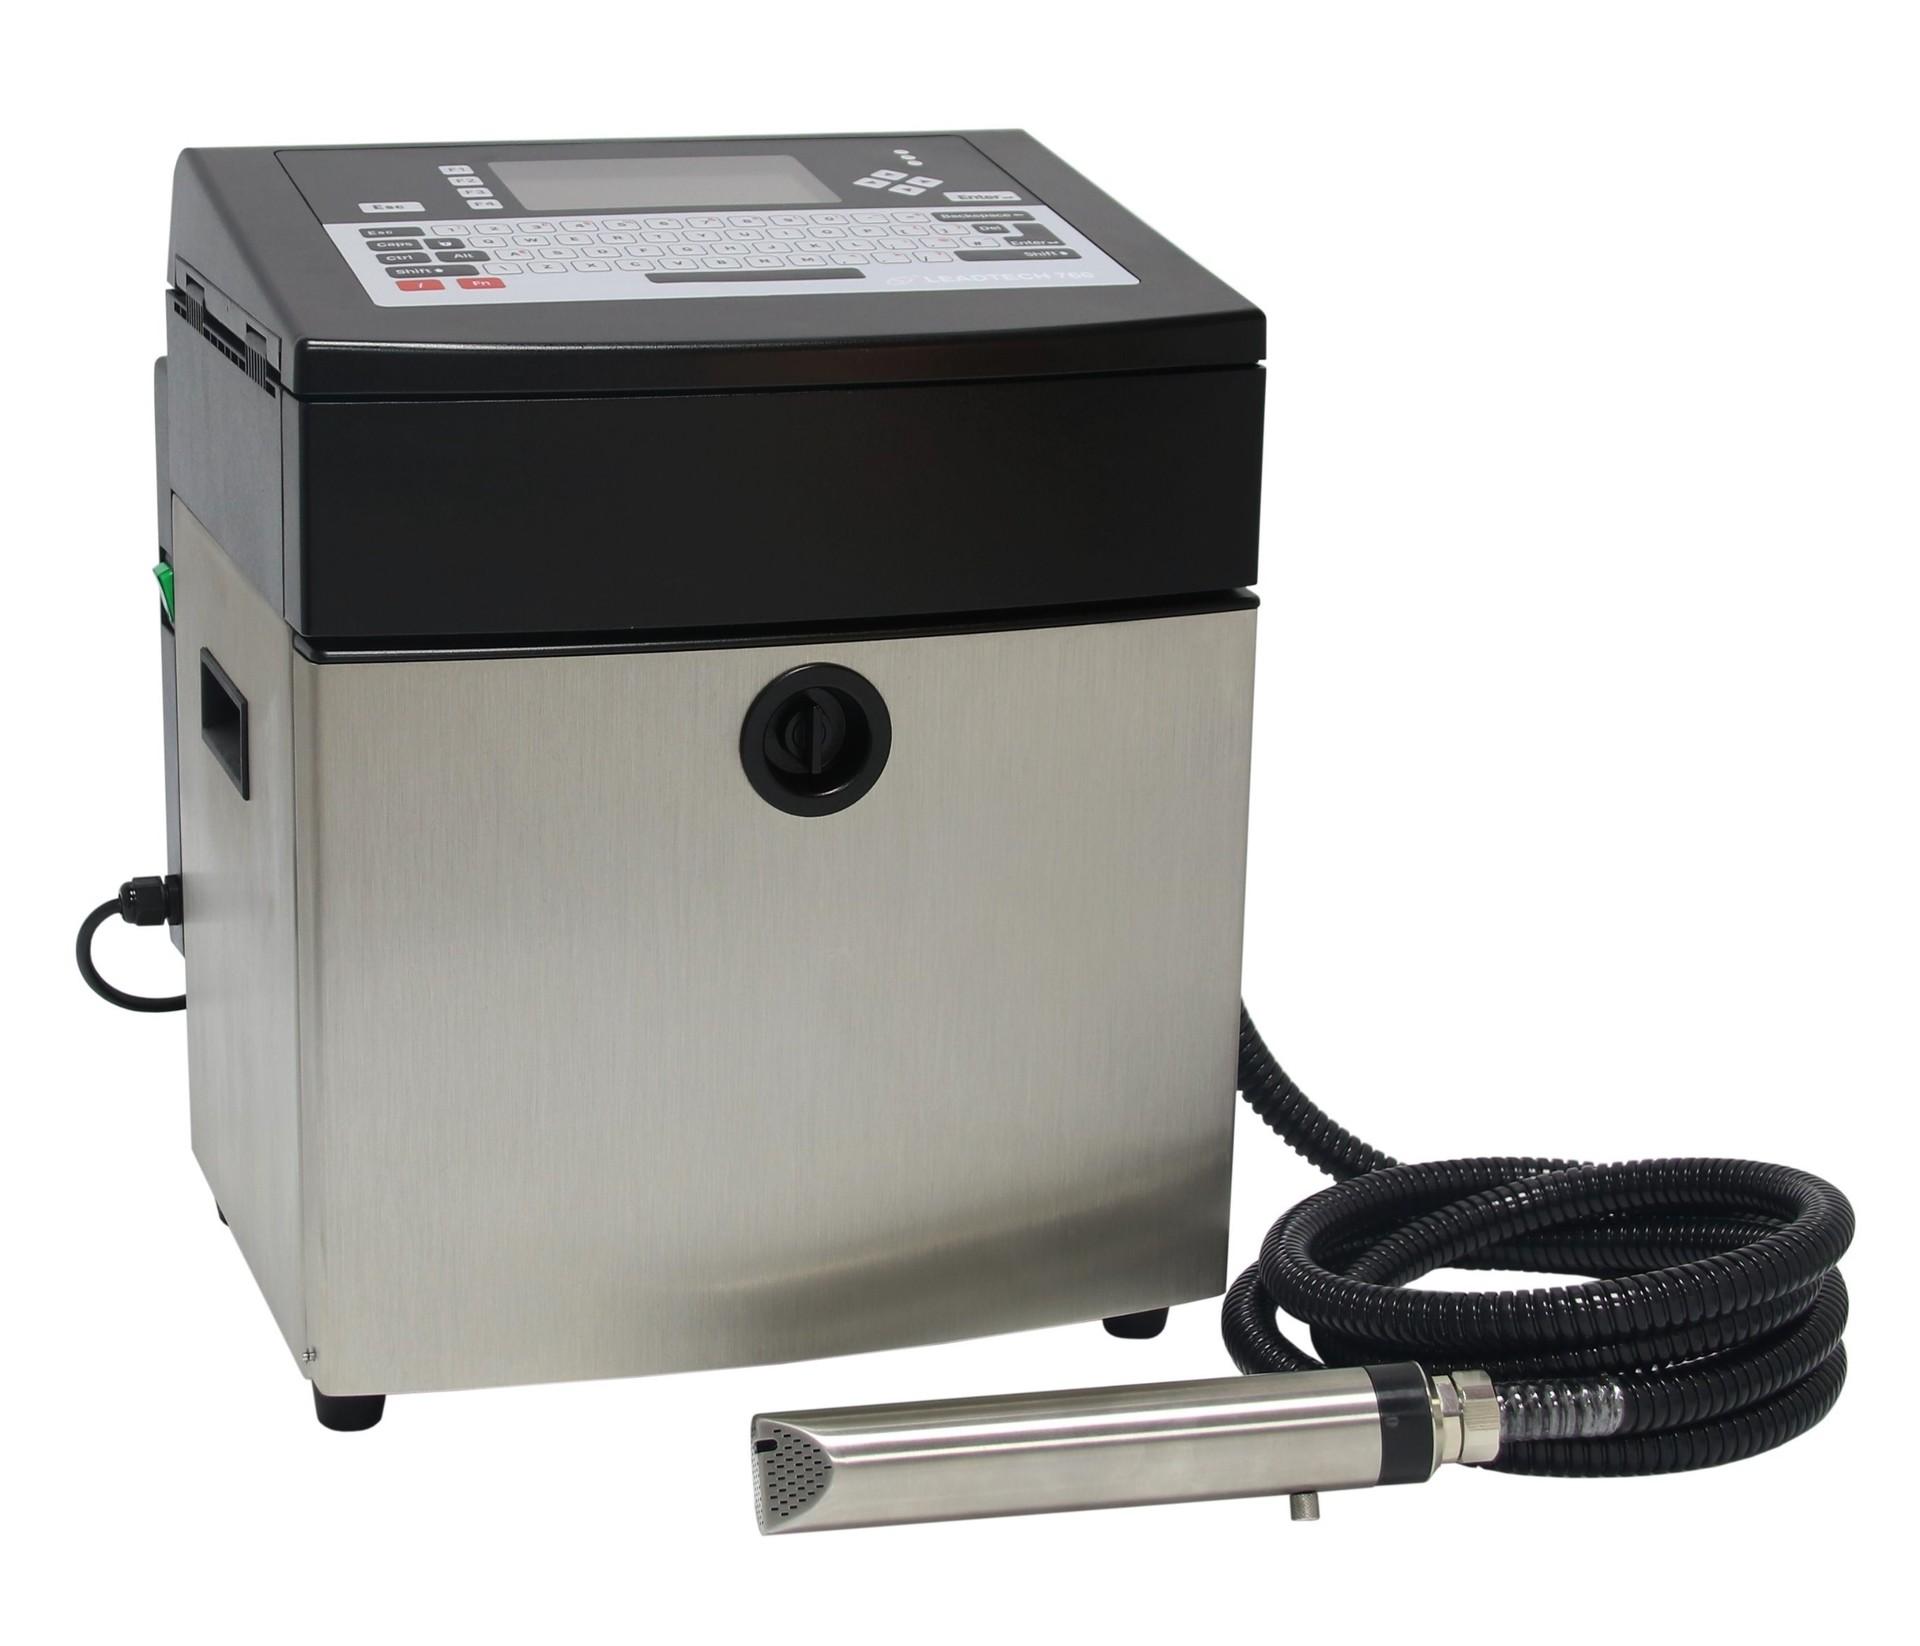 Lead Tech Lt760 PE Pipe Coding Cij Inkjet Printer